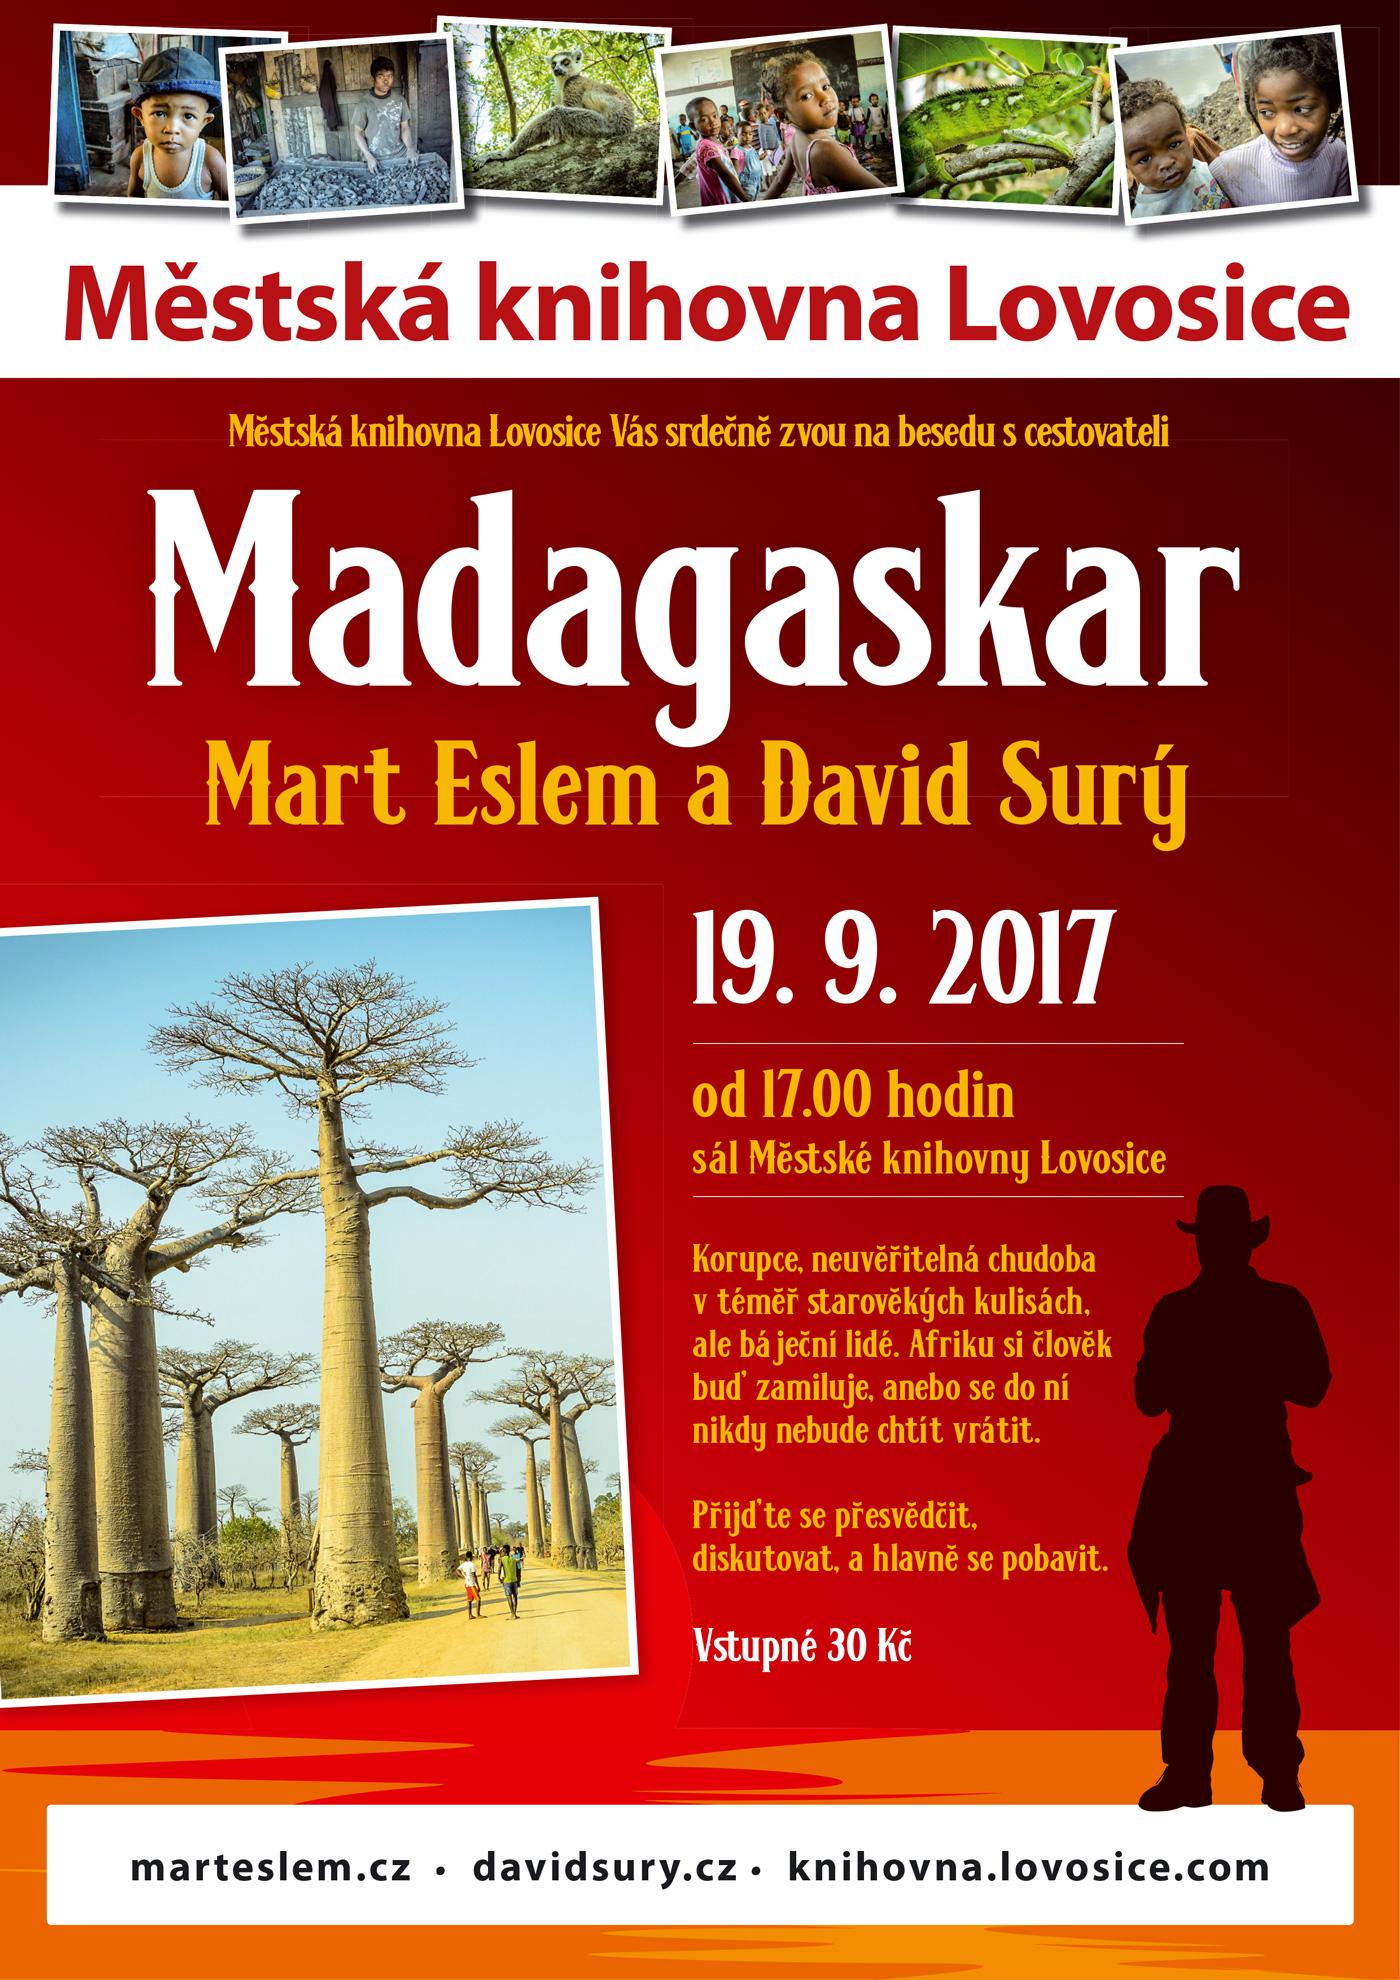 Mart Eslem a David Surý Madagaskar knihovna Lovosice